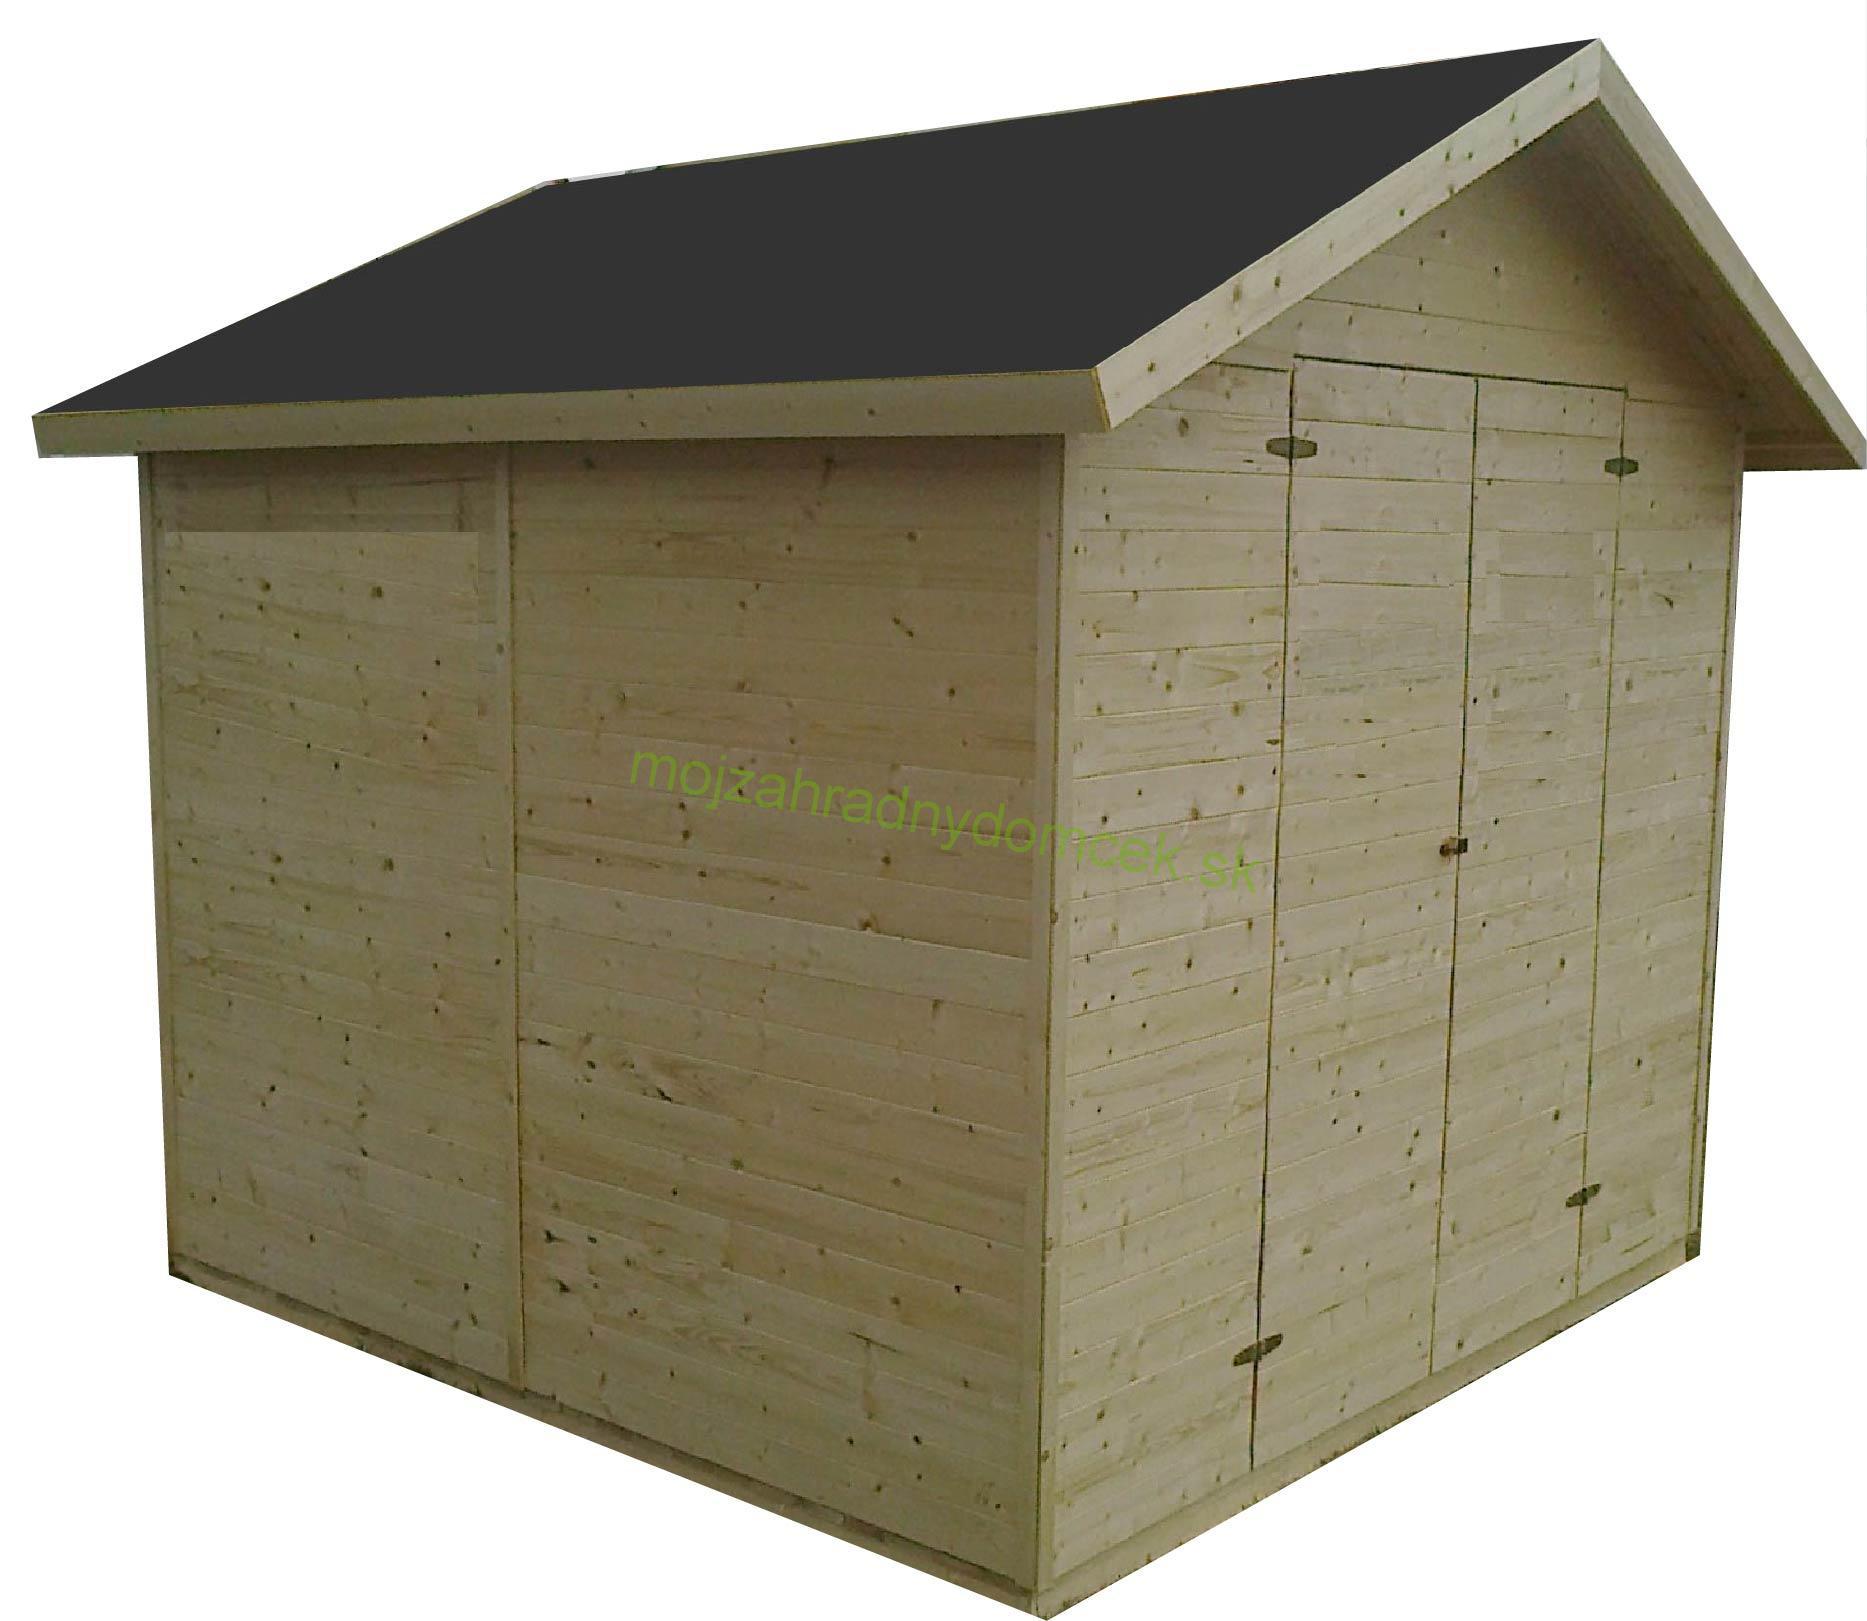 2ab0cb7d030aa Domčeky do plochy 12m2 | Záhradný drevený domček 3,3x3,3m, (16mm ...